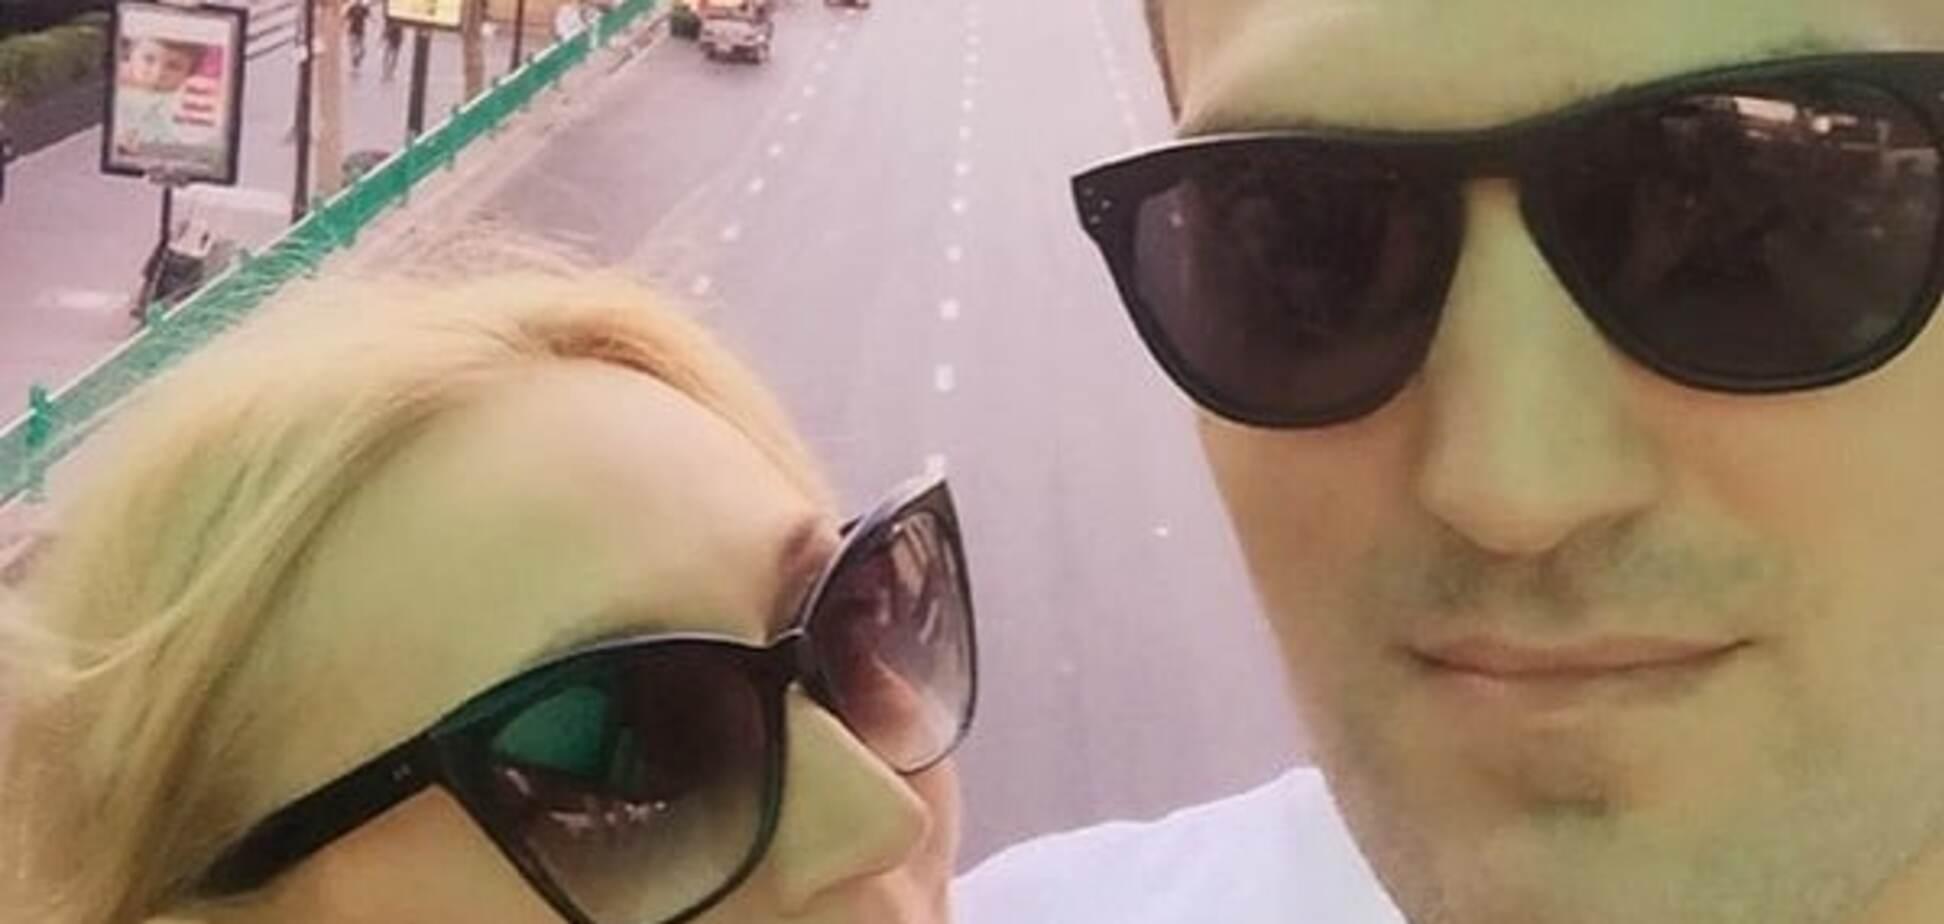 Орбакайте развлеклась с мужем в Тайланде: опубликованы фото